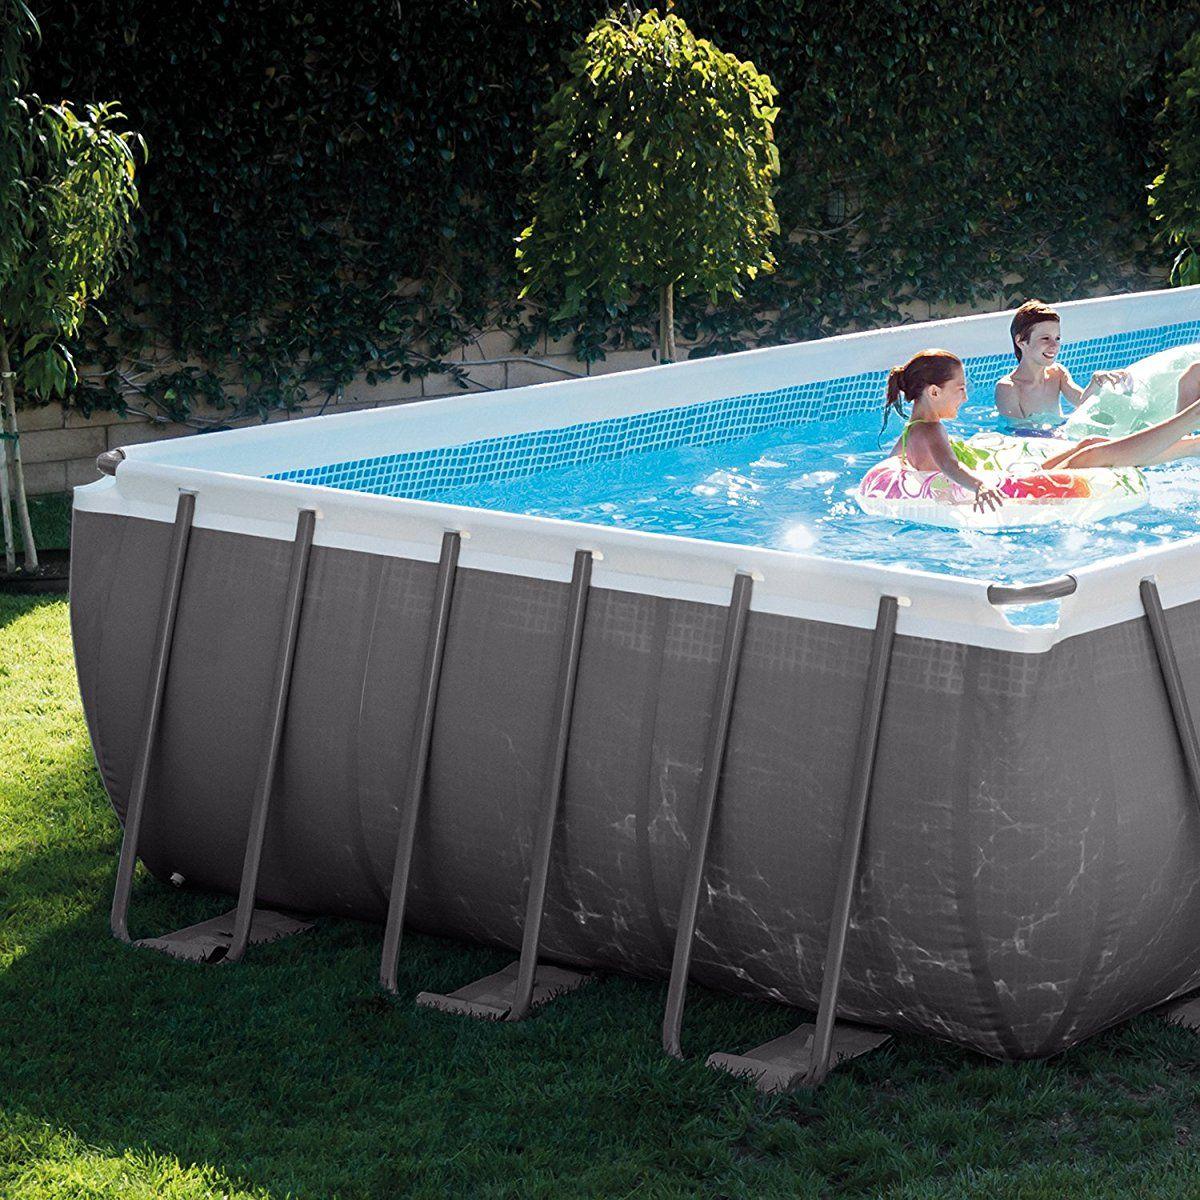 Intex Rectangular Ultra Frame Pool Set 24 Feet By 12 Feet By 52 Inch Pool Rectangular Pool Intex